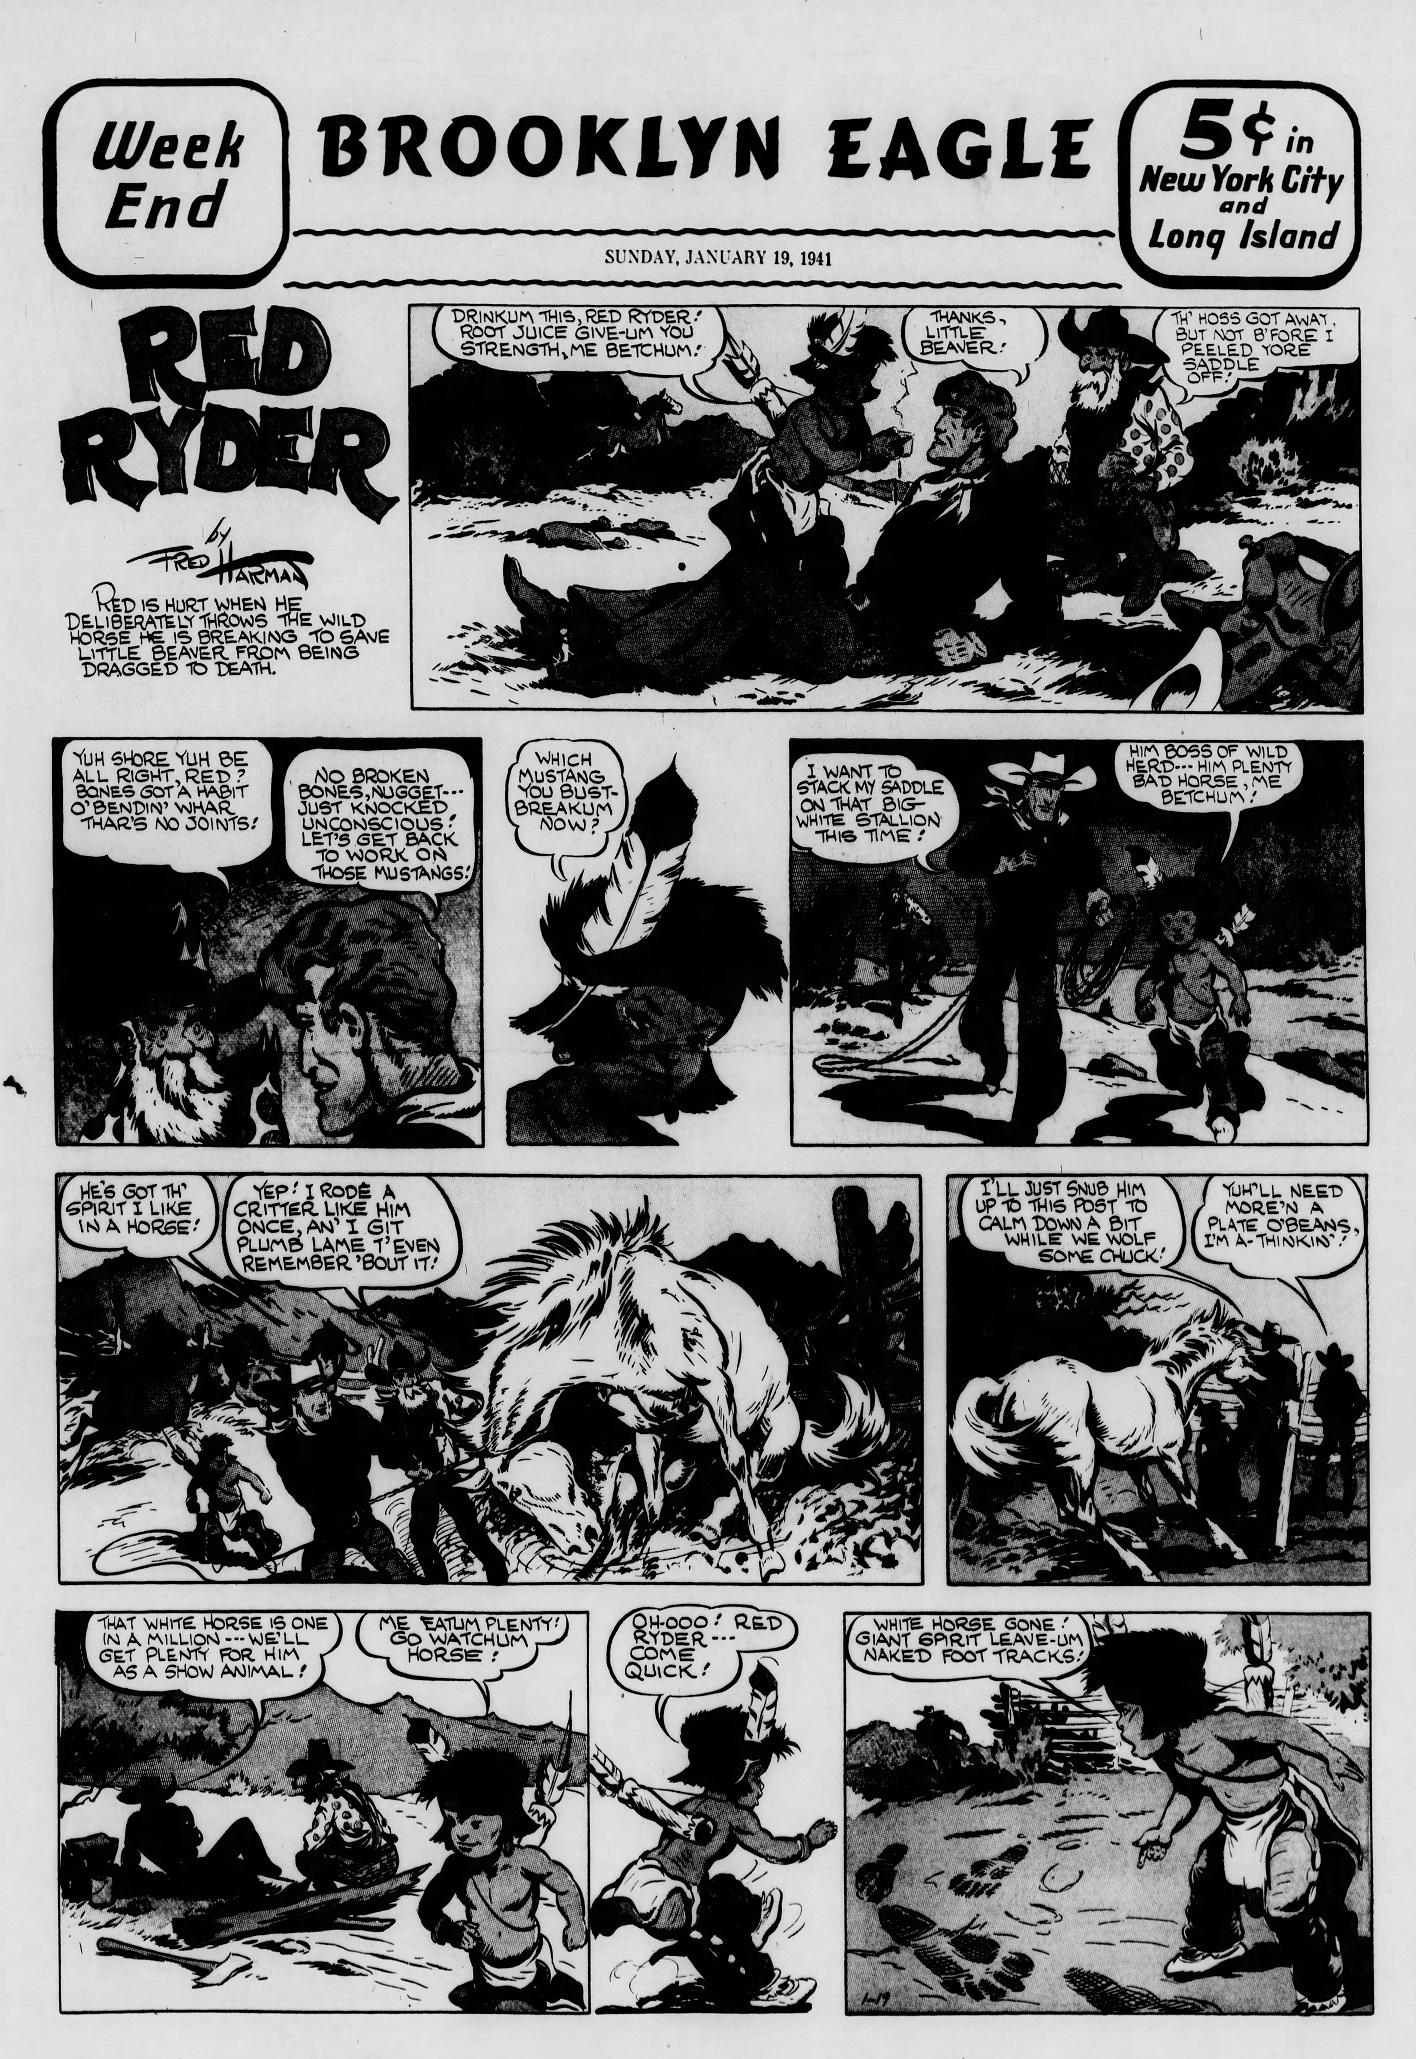 The_Brooklyn_Daily_Eagle_Sun__Jan_19__1941_(4).jpg